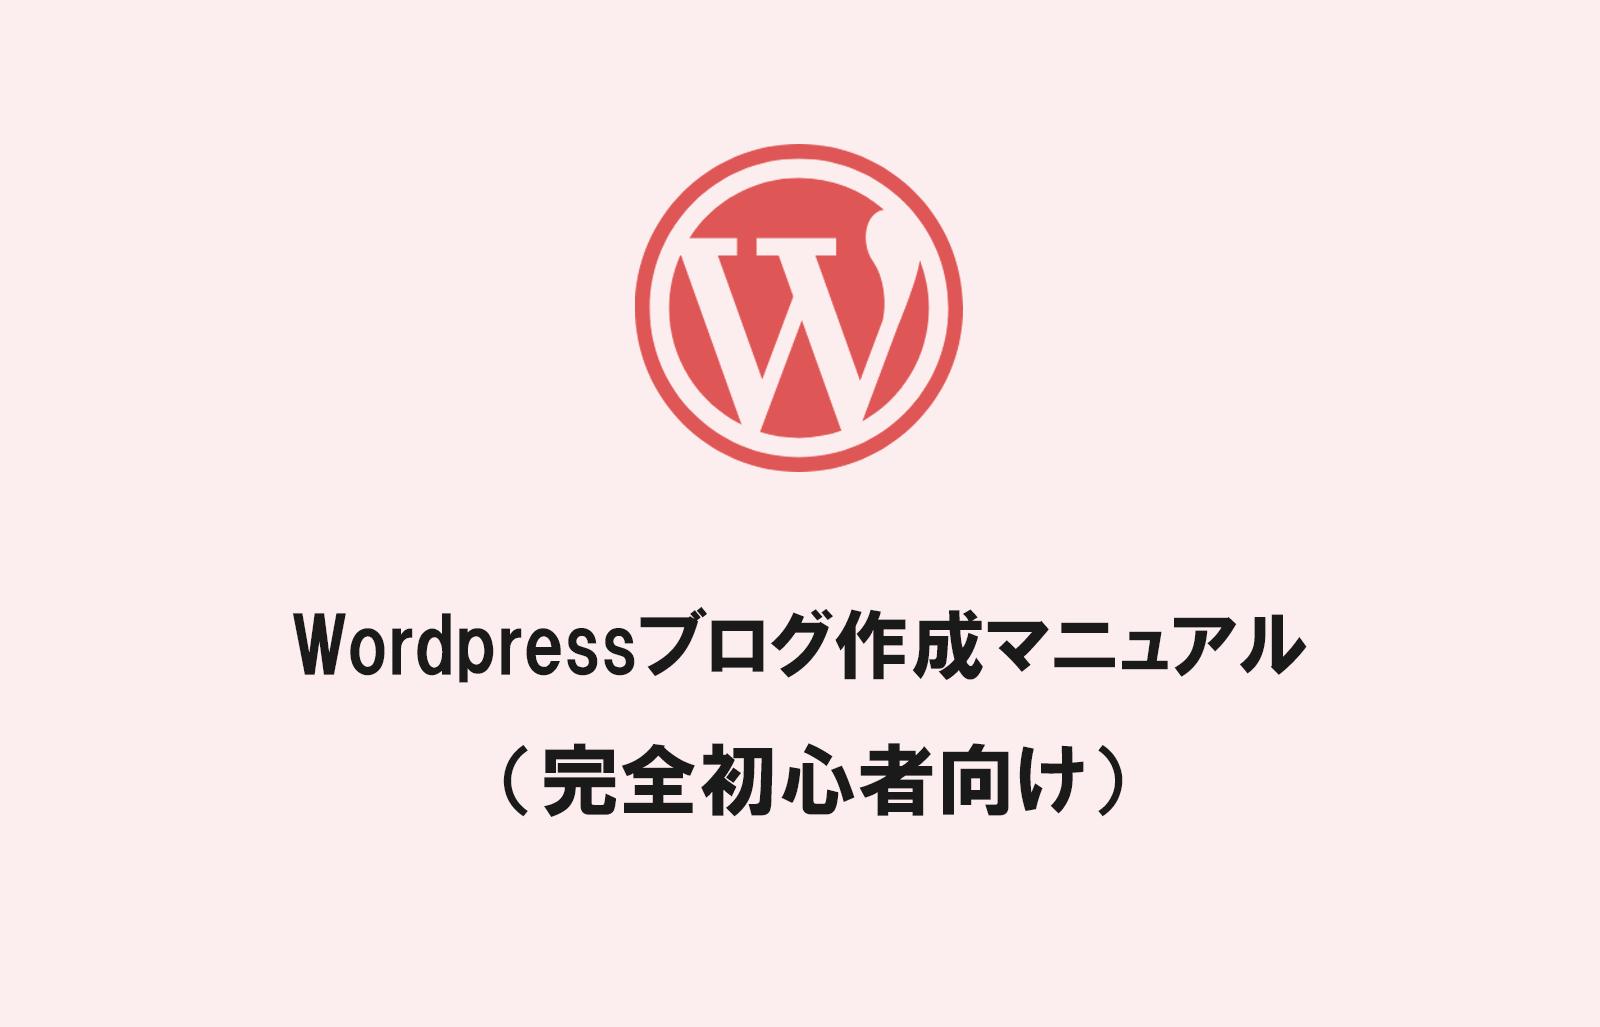 Wordpressブログ作成完全マニュアル(完全初心者向け)